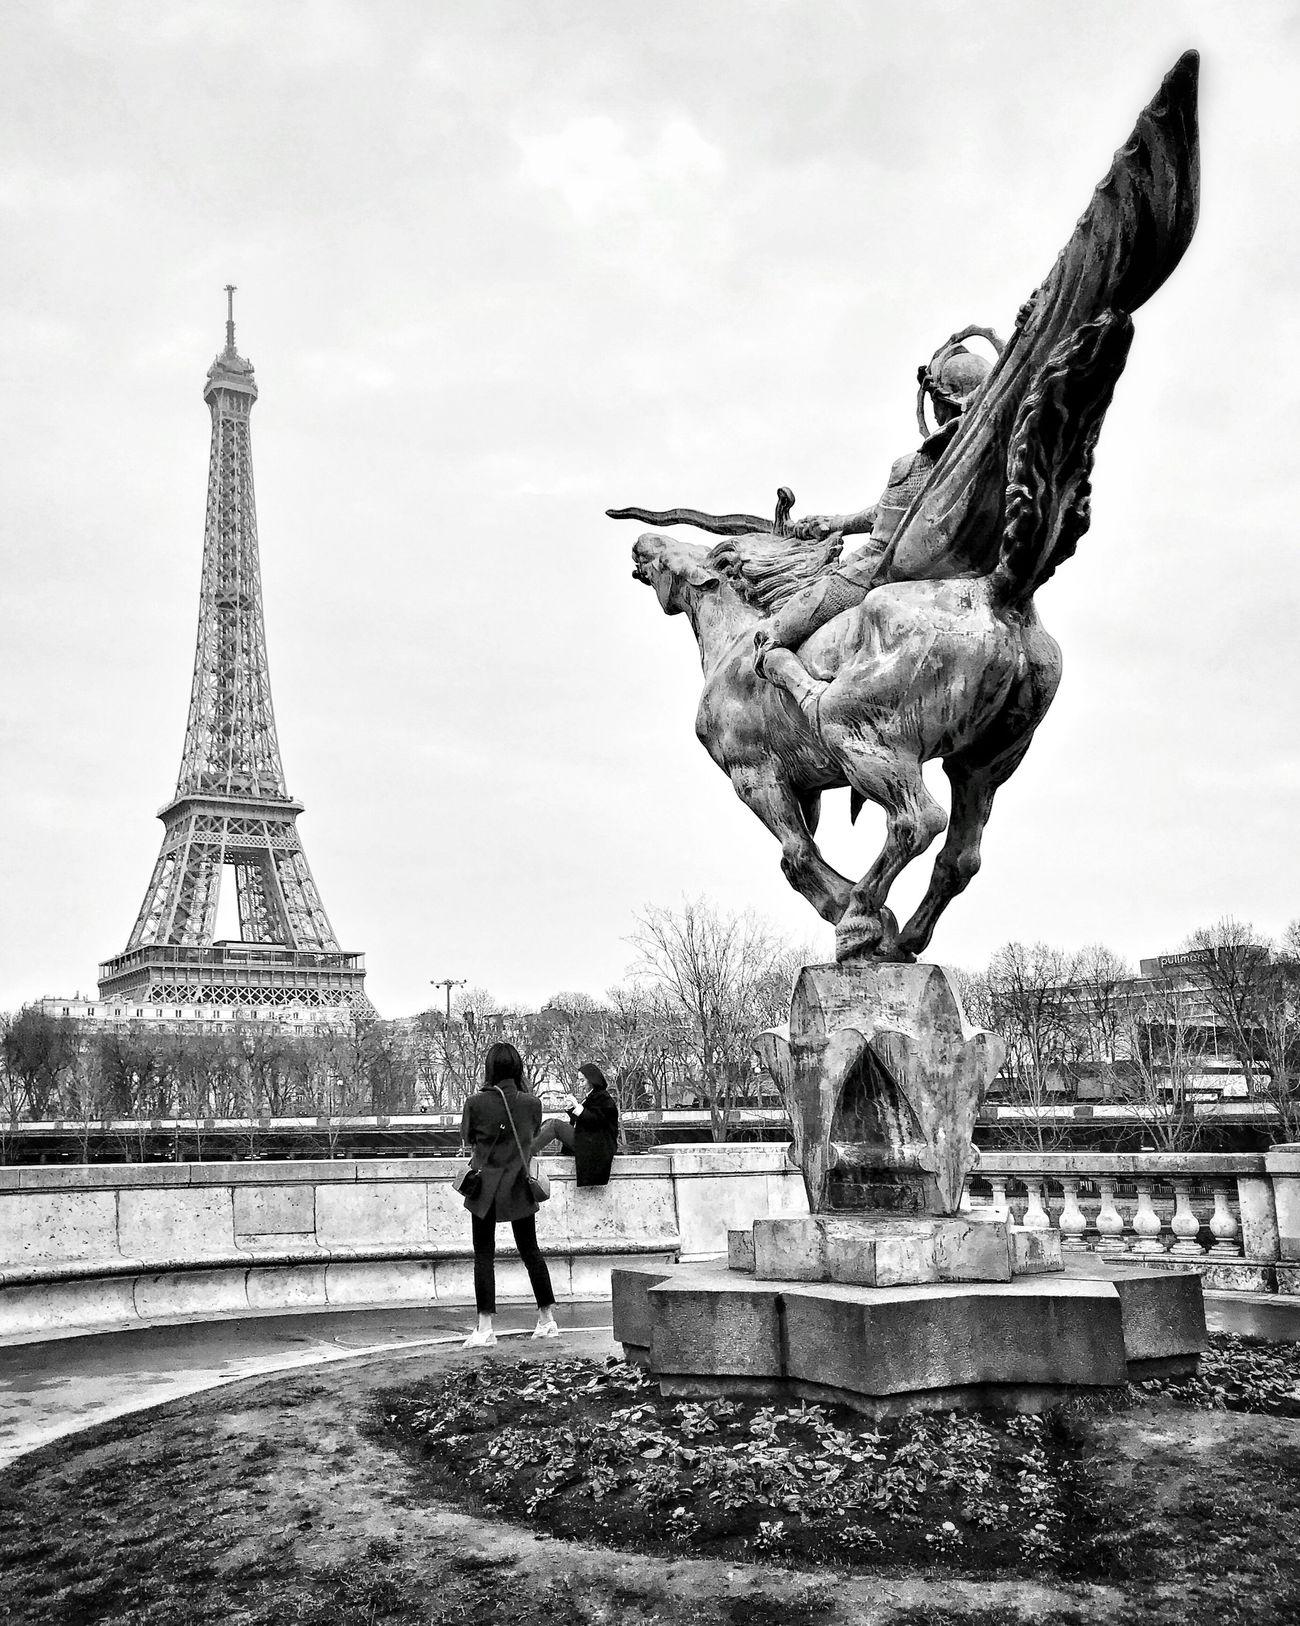 Grey Skies! Bon dimanche! City Statue Eyem Best Shot - Architecture Bnw_collection Bnw_captures Bnw_life EyeEm Best Shots Paris Parisweloveyou Photooftheday Paris ❤ Tour Eiffel Eiffel Tower EyeEm Bnw